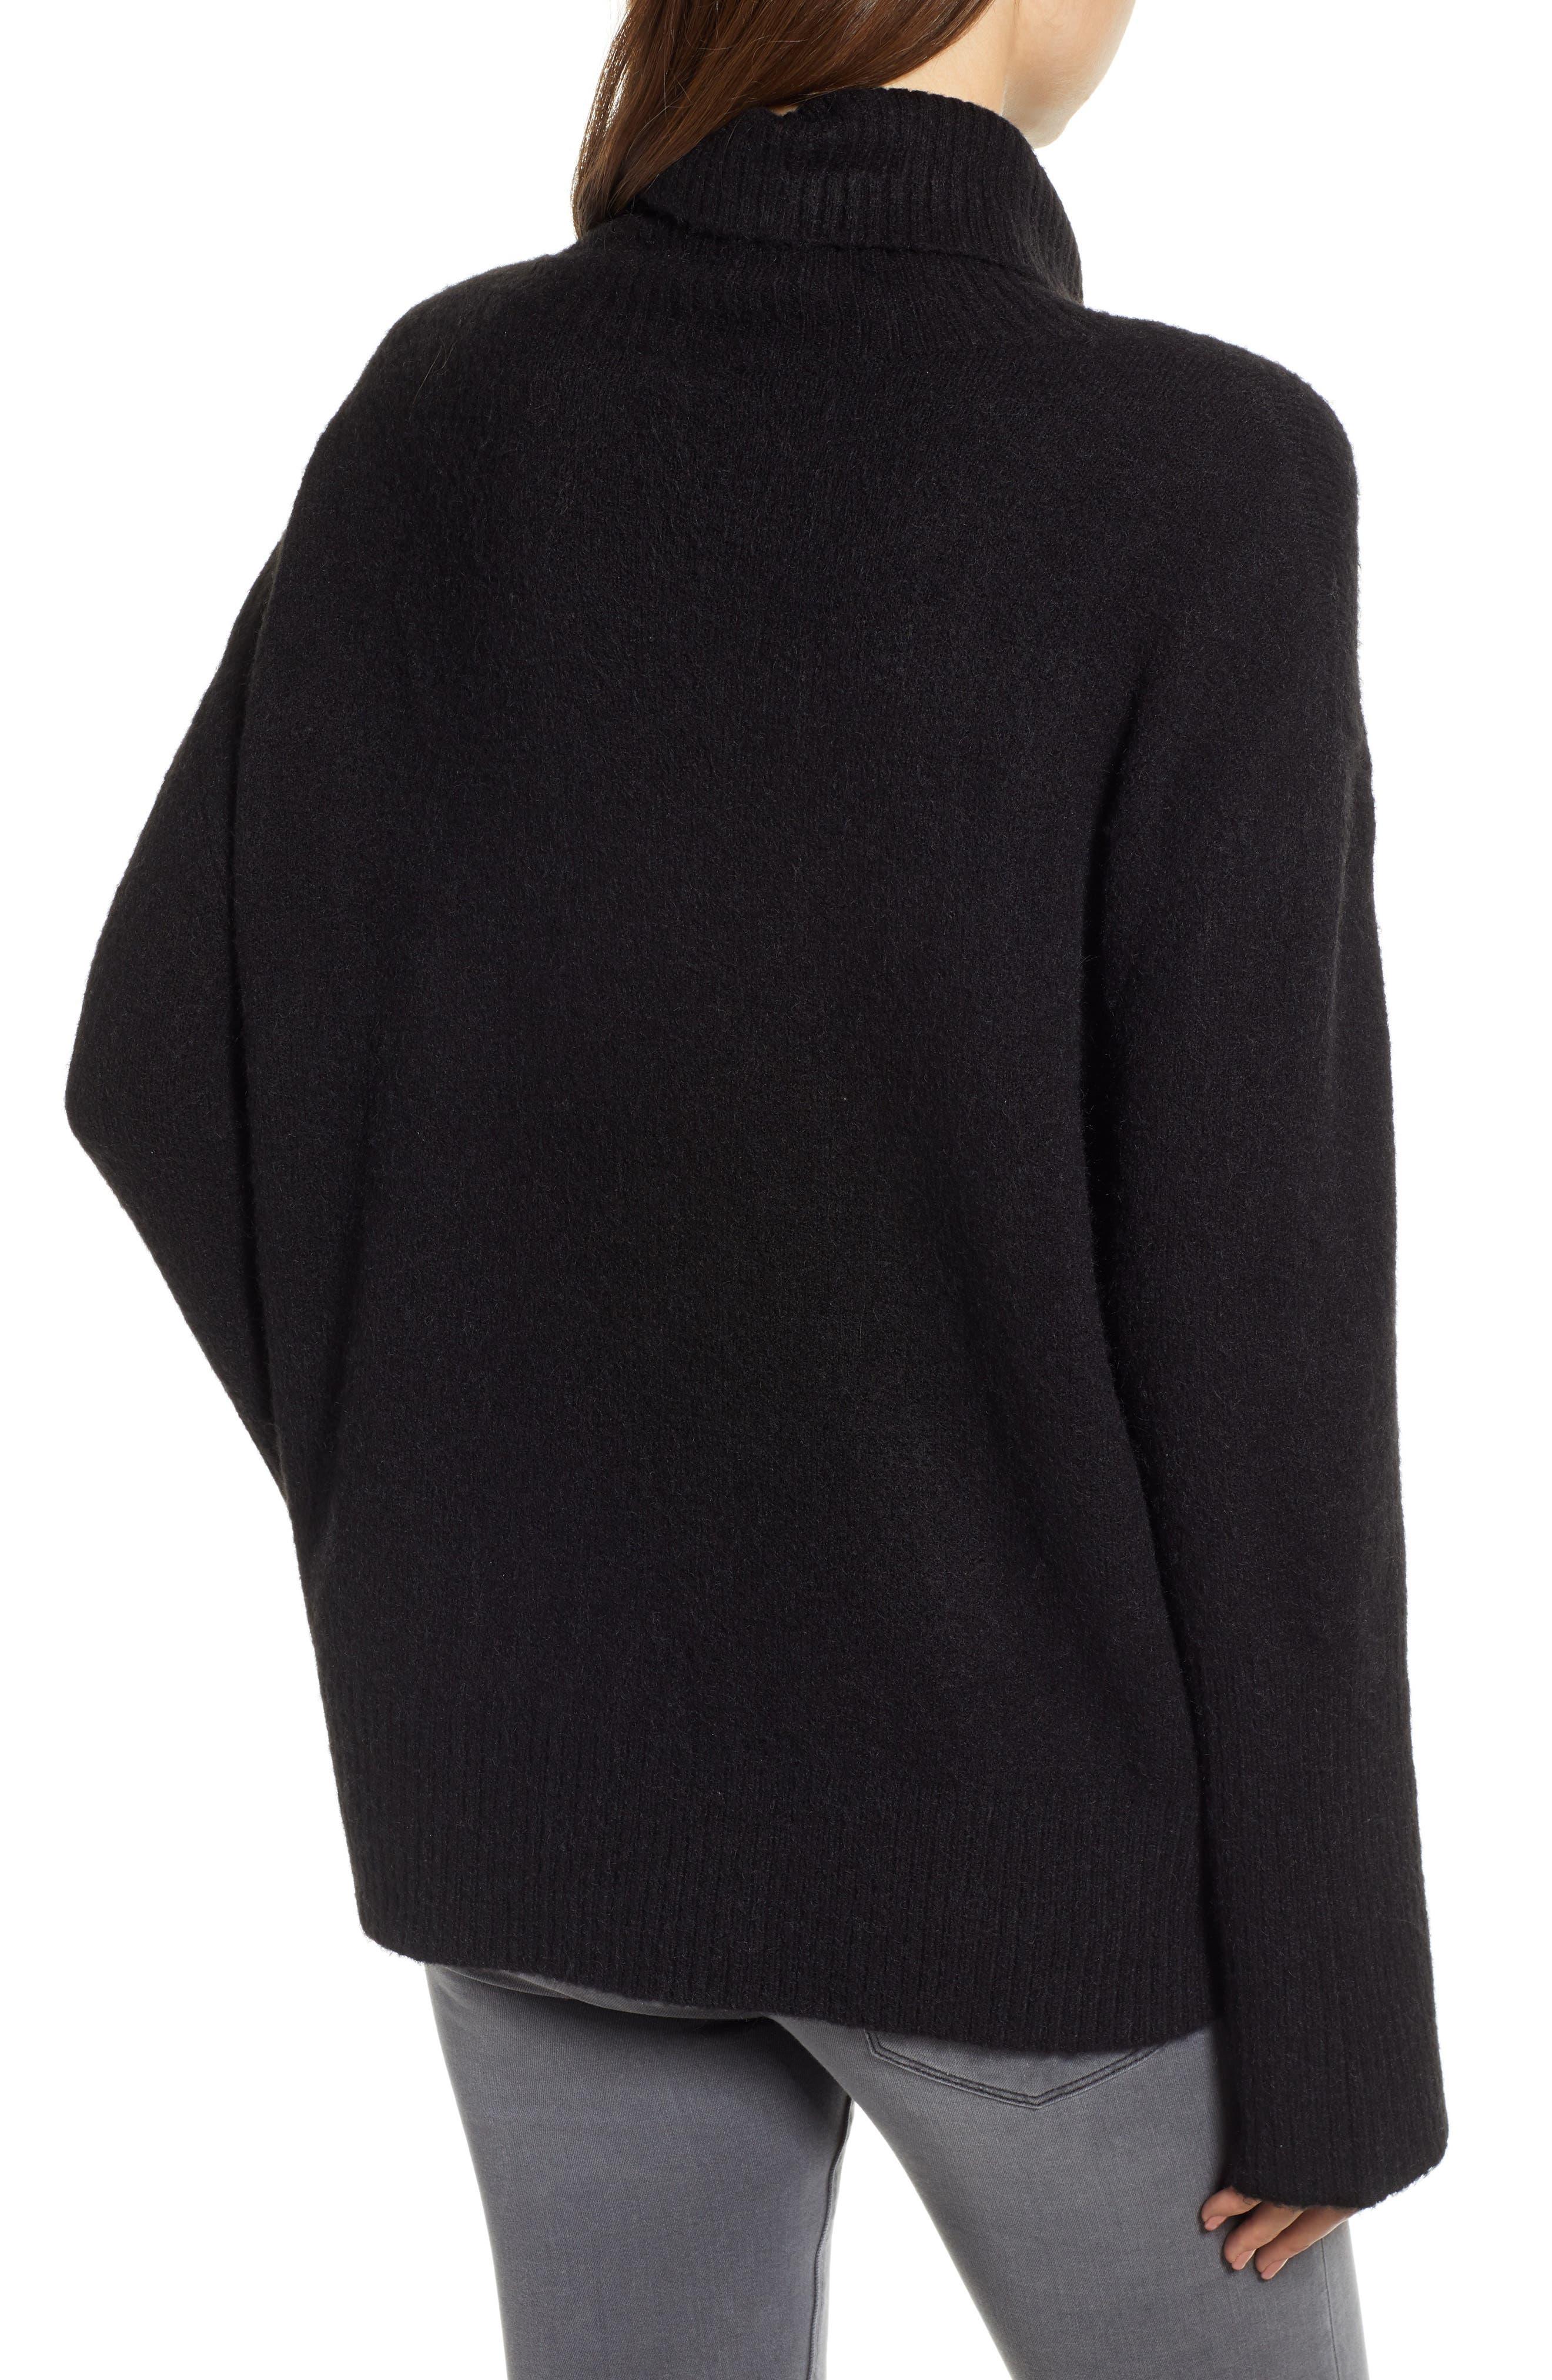 HINGE,                             Bell Sleeve Sweater,                             Alternate thumbnail 2, color,                             BLACK